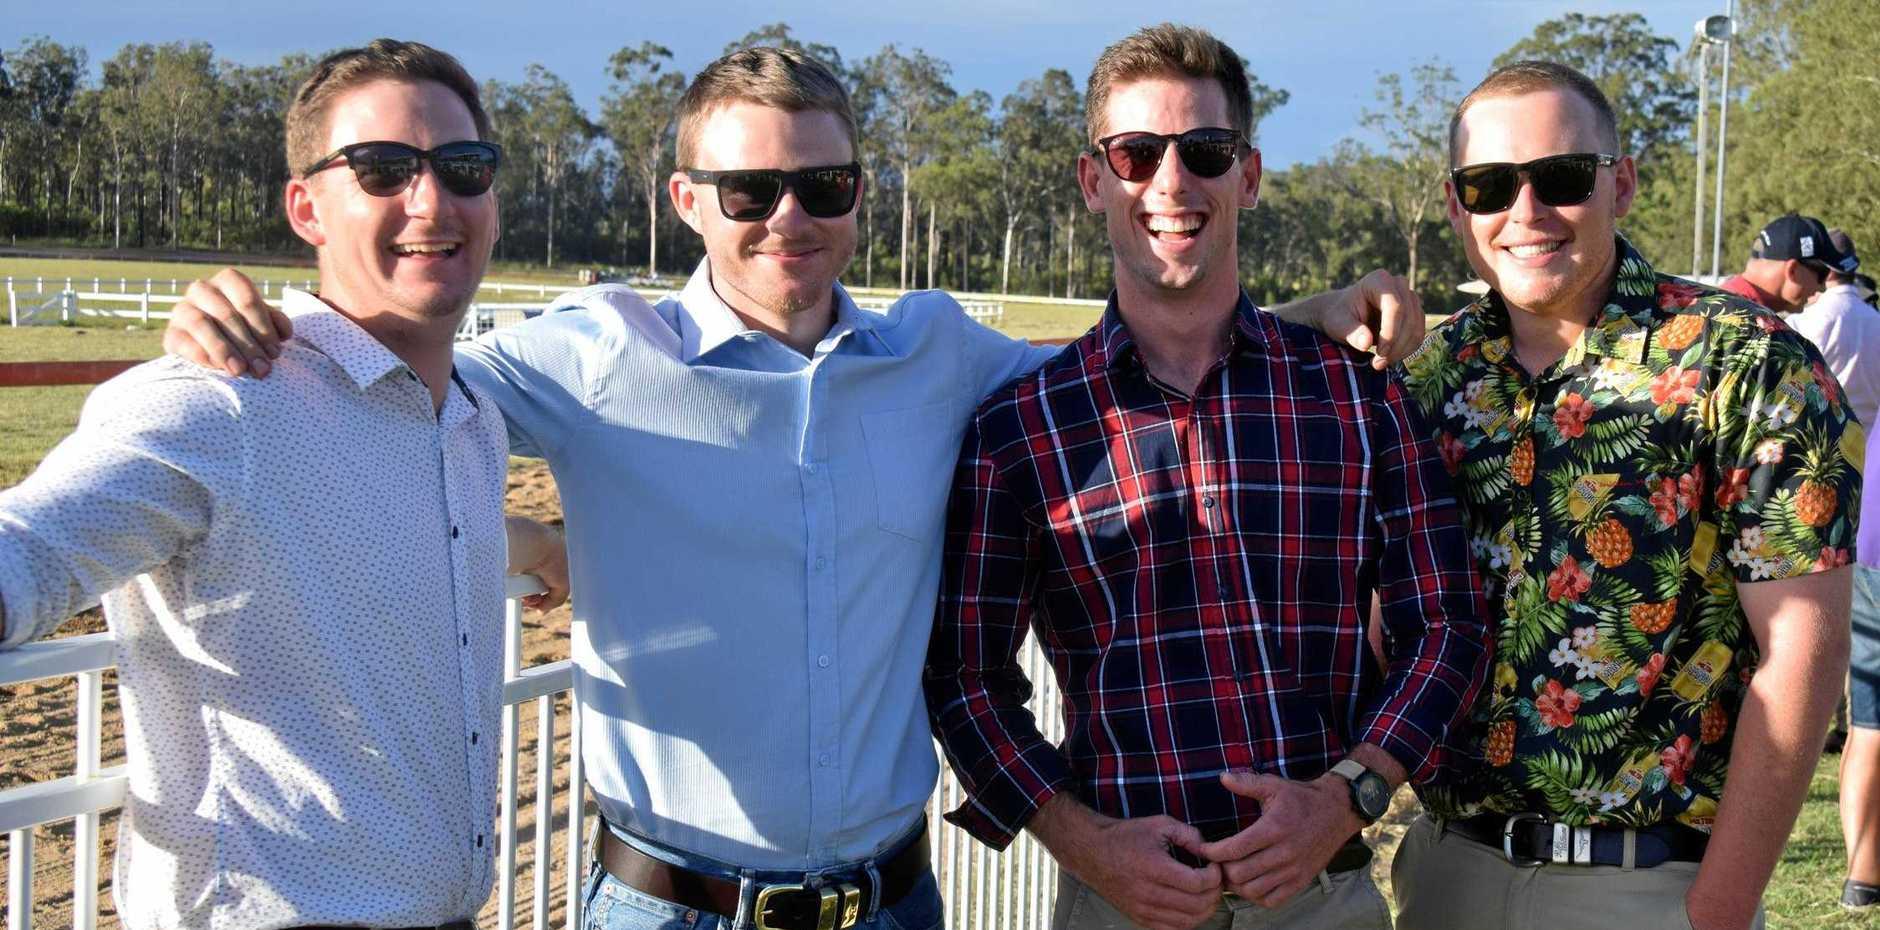 TOP MATES: Tom Patton, Jimmy McKinnon, Stuart Robinson and Dylan Parker catch up at the Wondai Races.